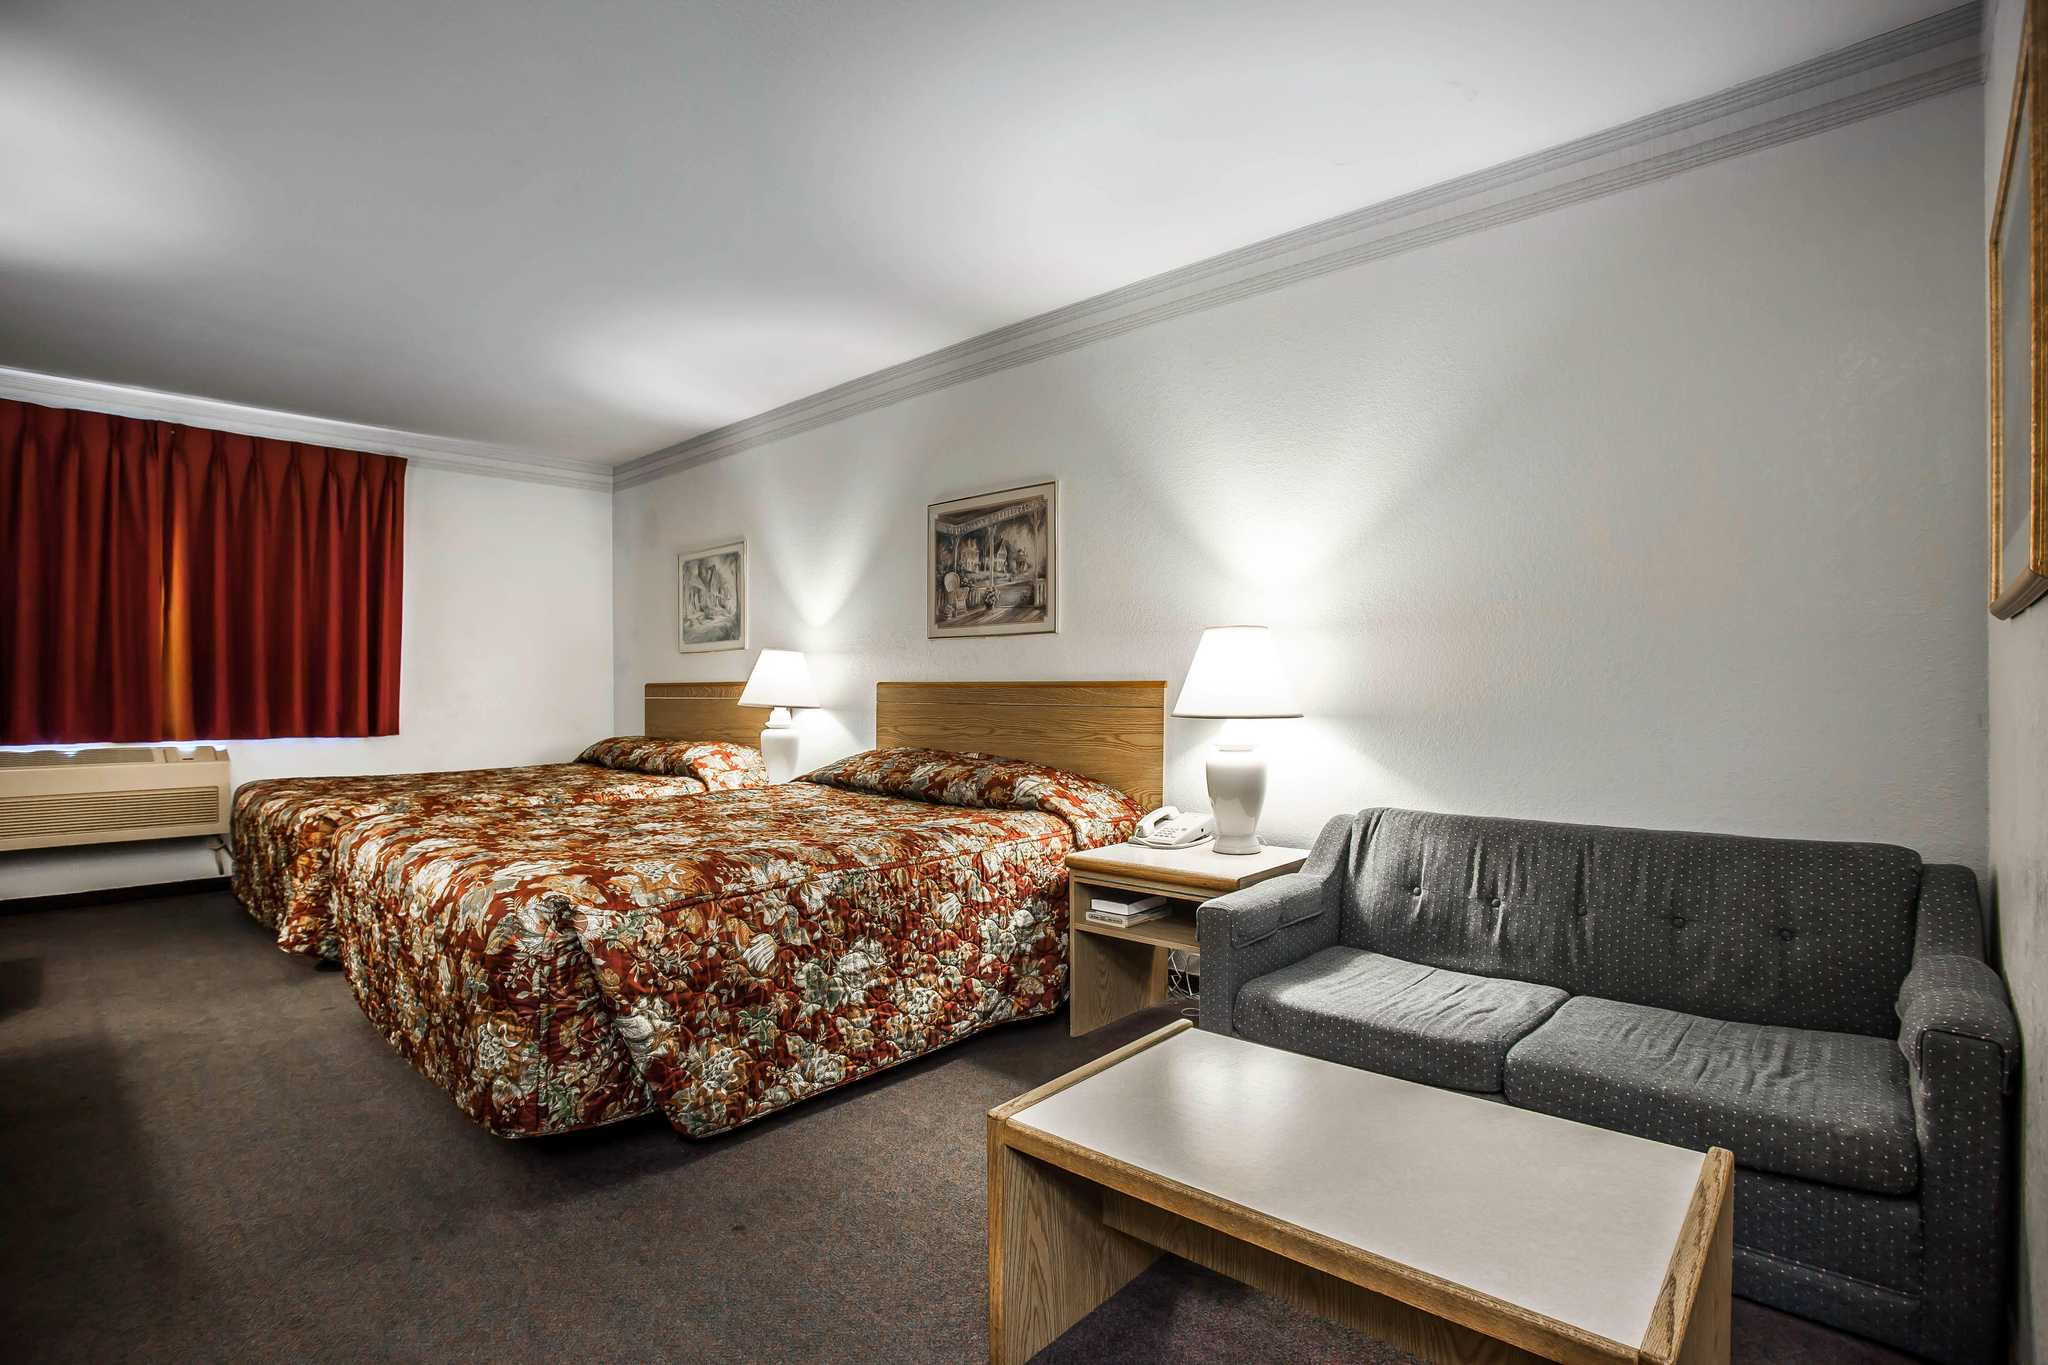 Econo Lodge image 12